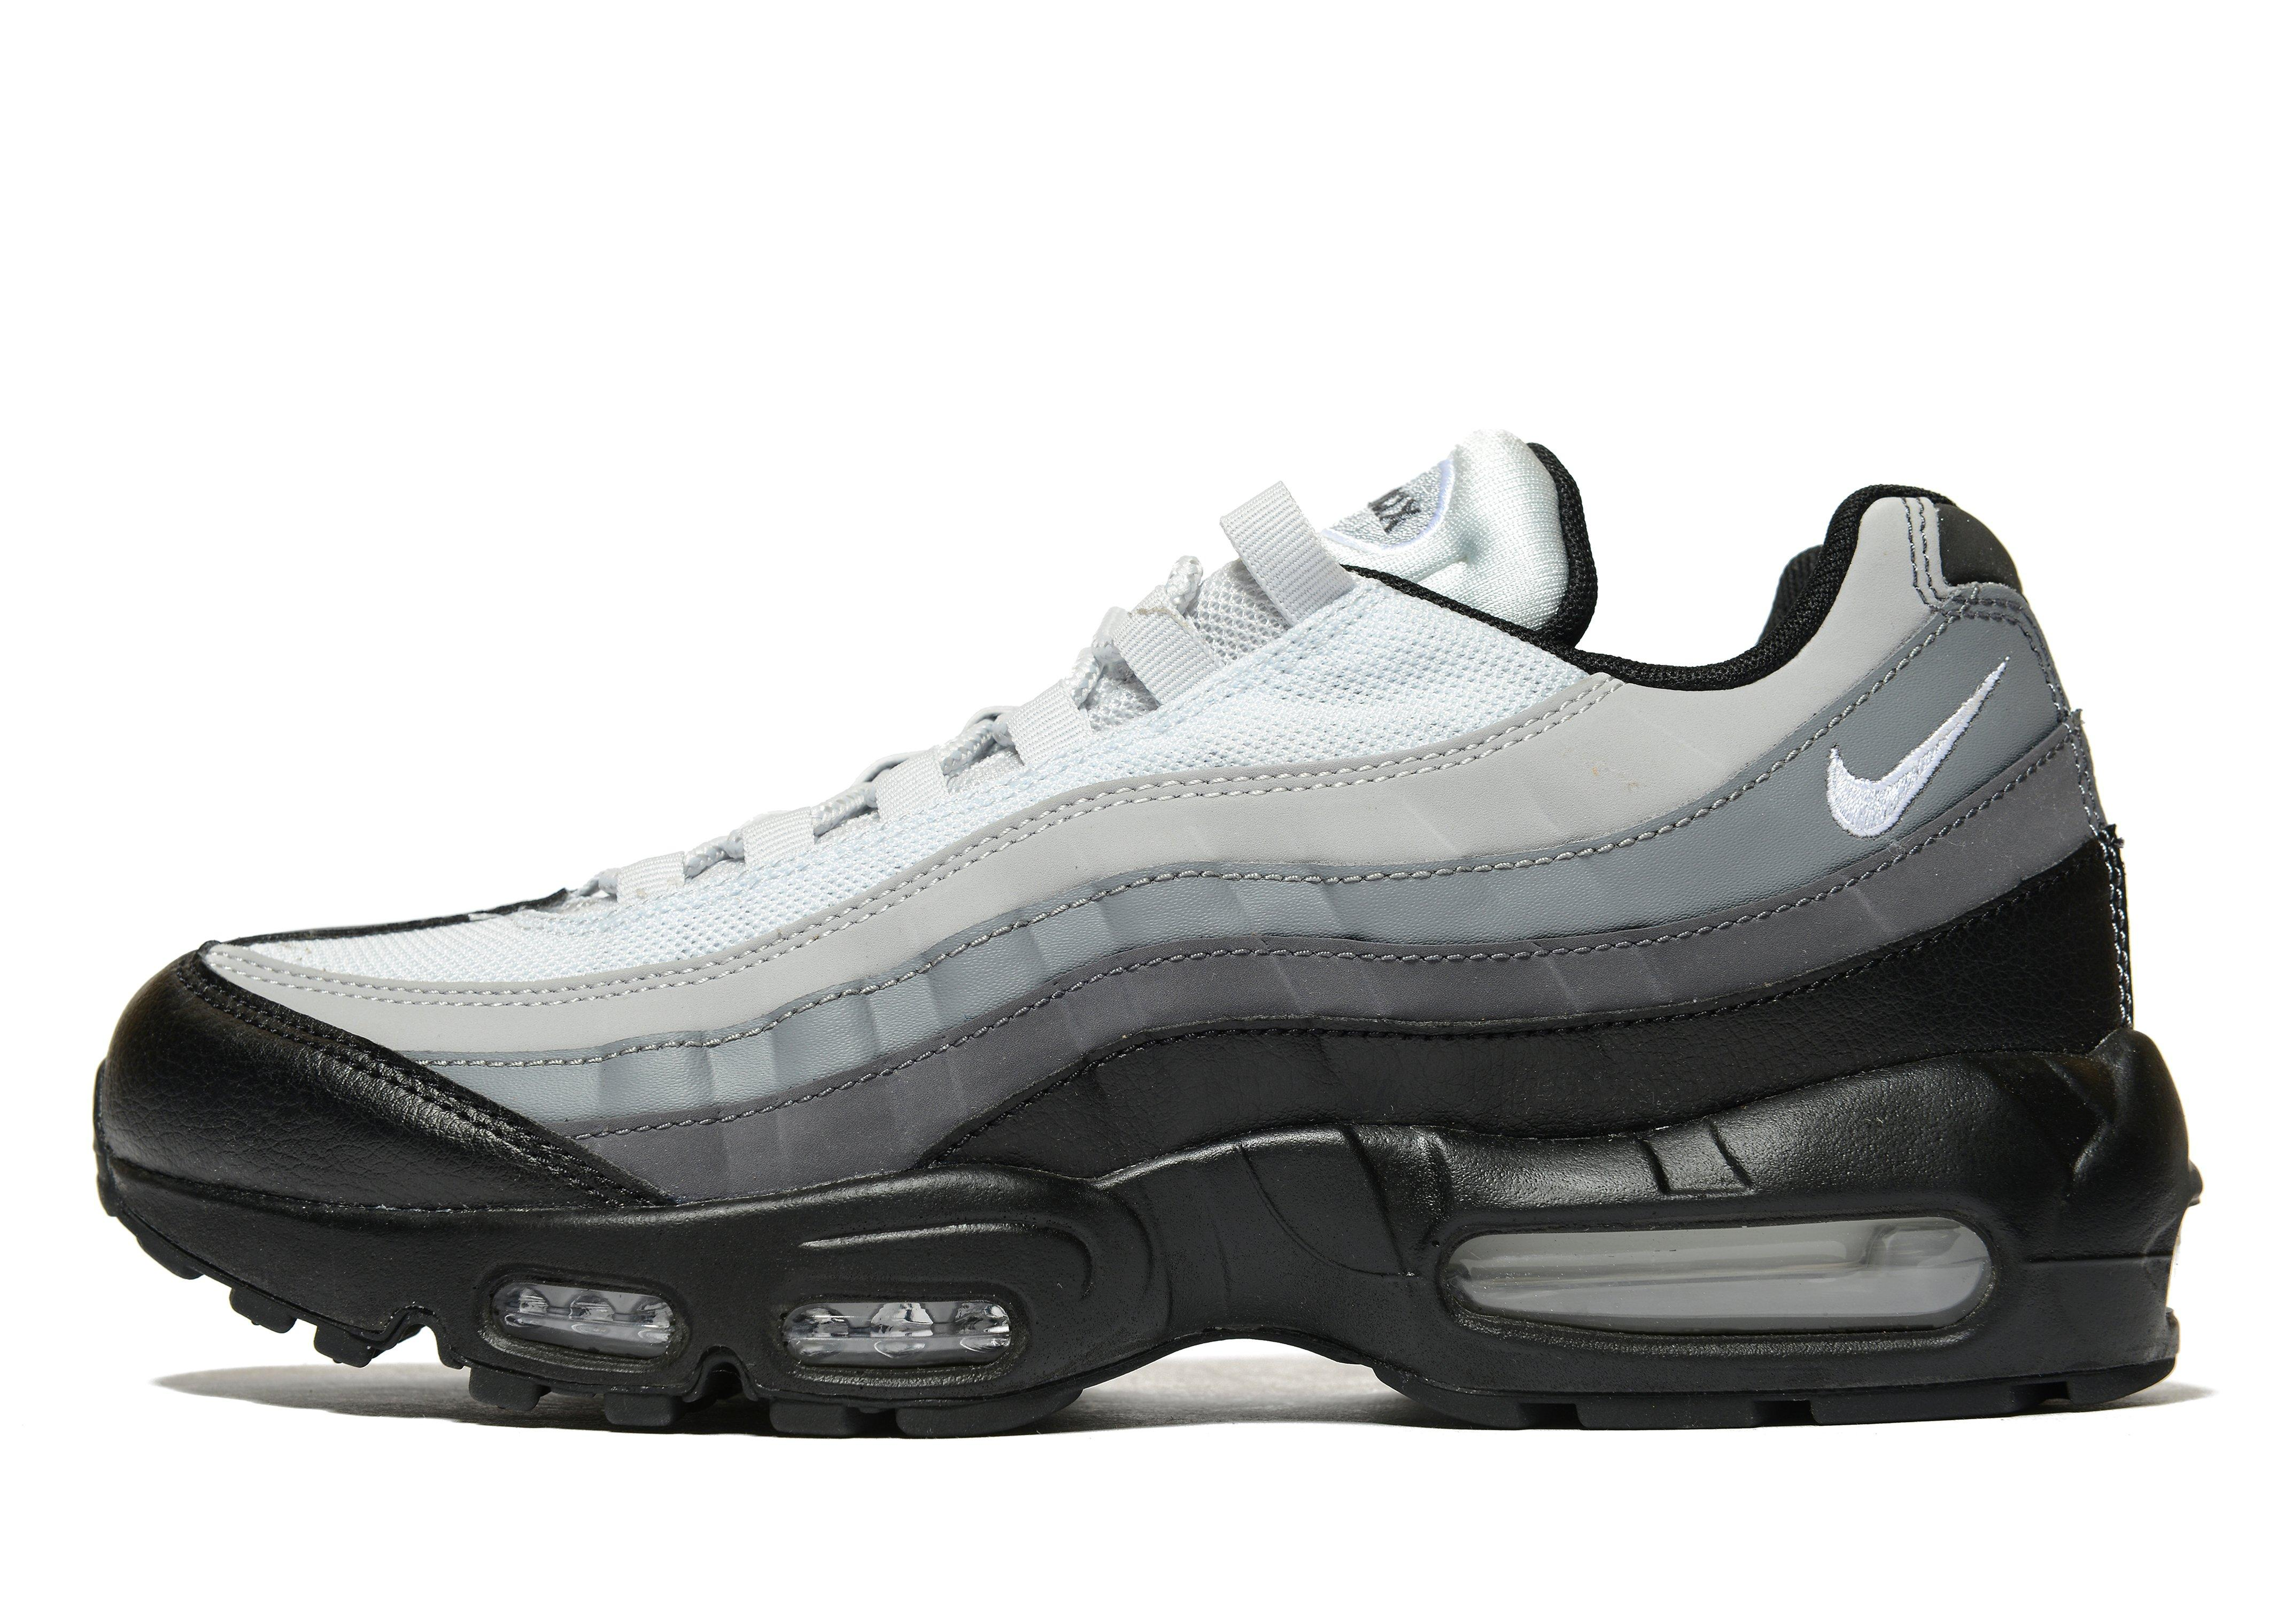 nike air max 95 black white grey